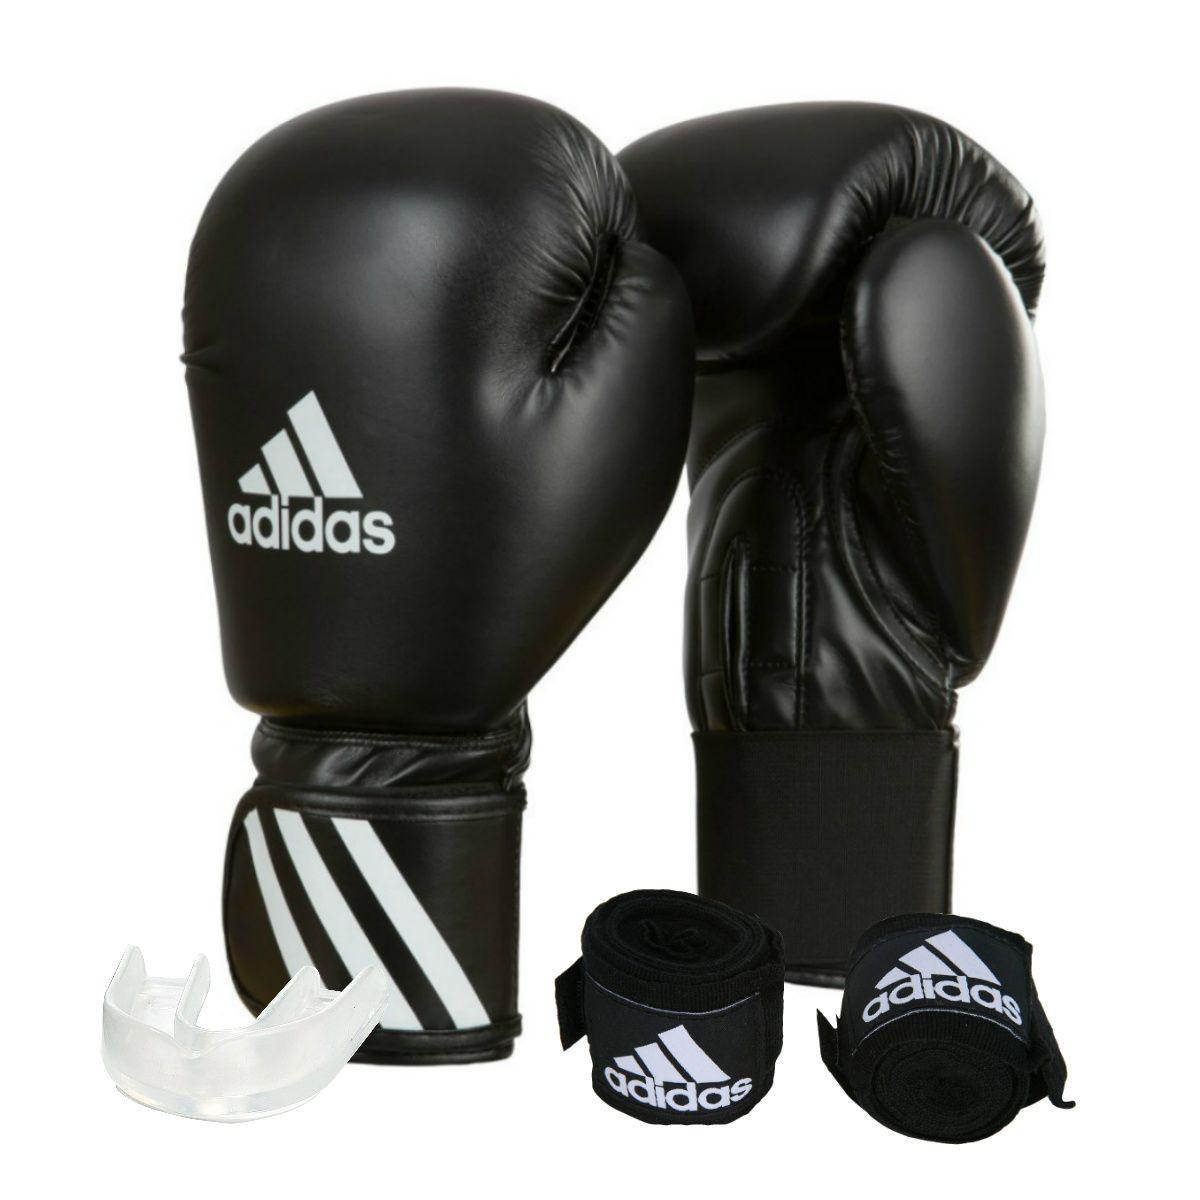 f738ea843 Kit Luva de Boxe Muay Thay Adidas Speed 50 + Bandagem 2